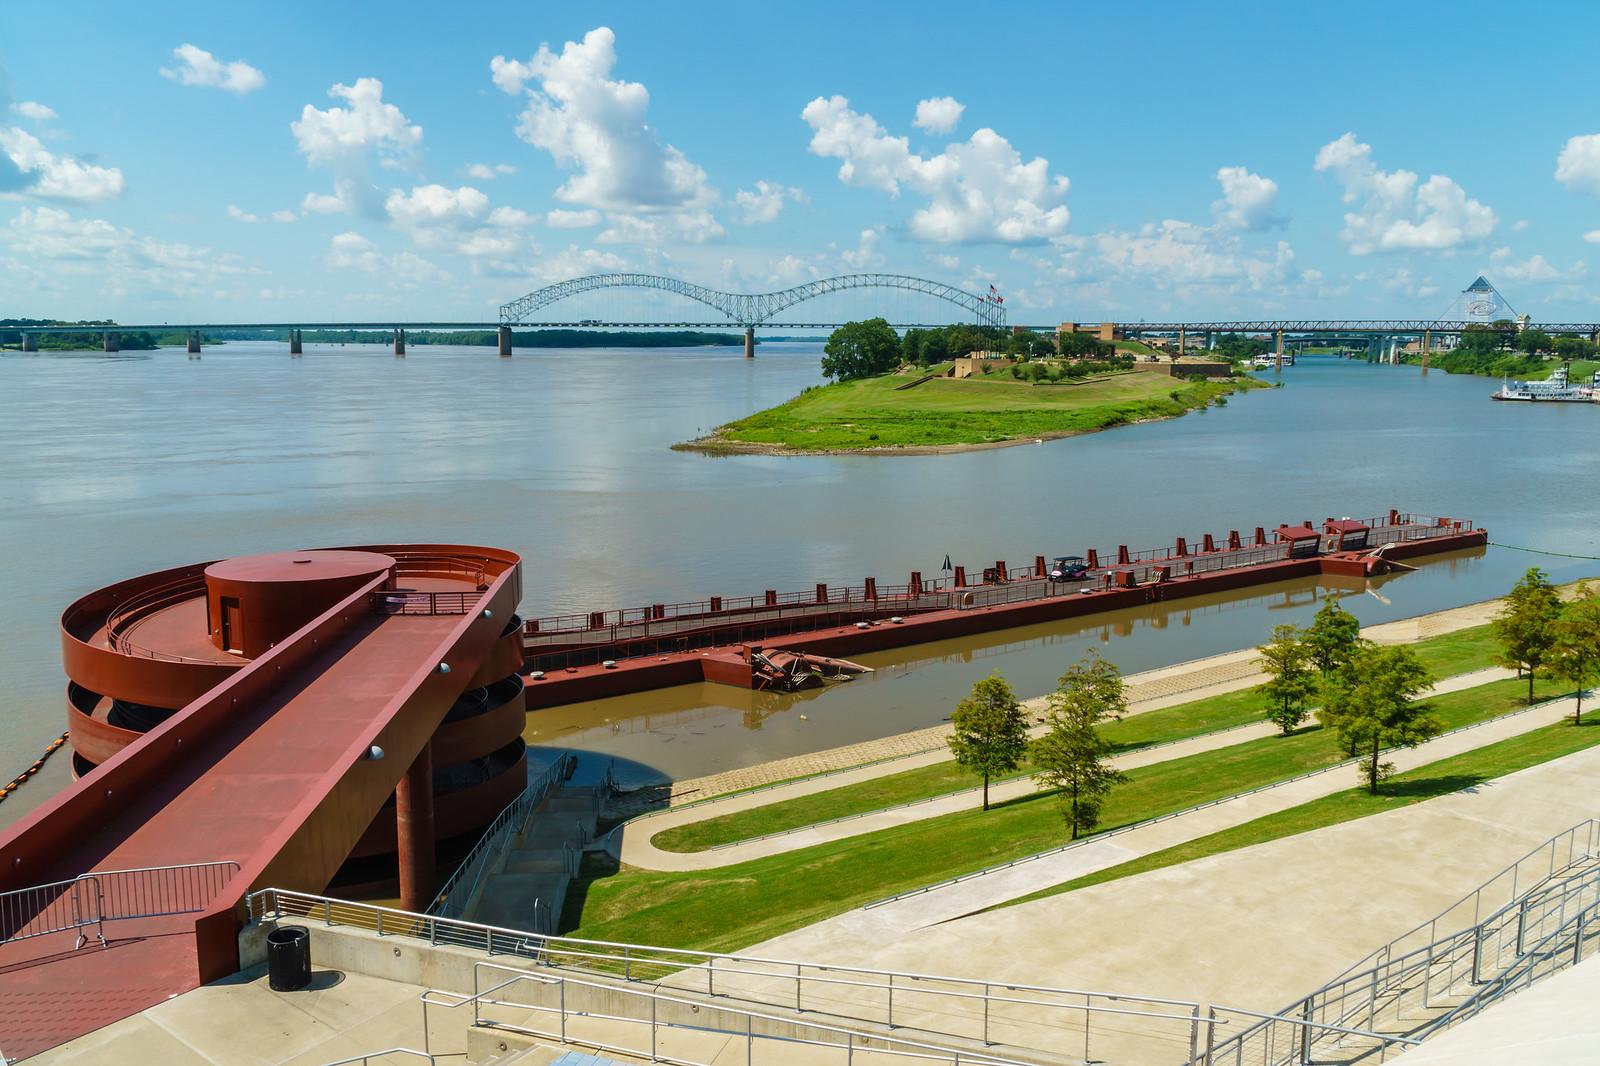 Mississippi River from Tom Lee Park, Memphis, TN